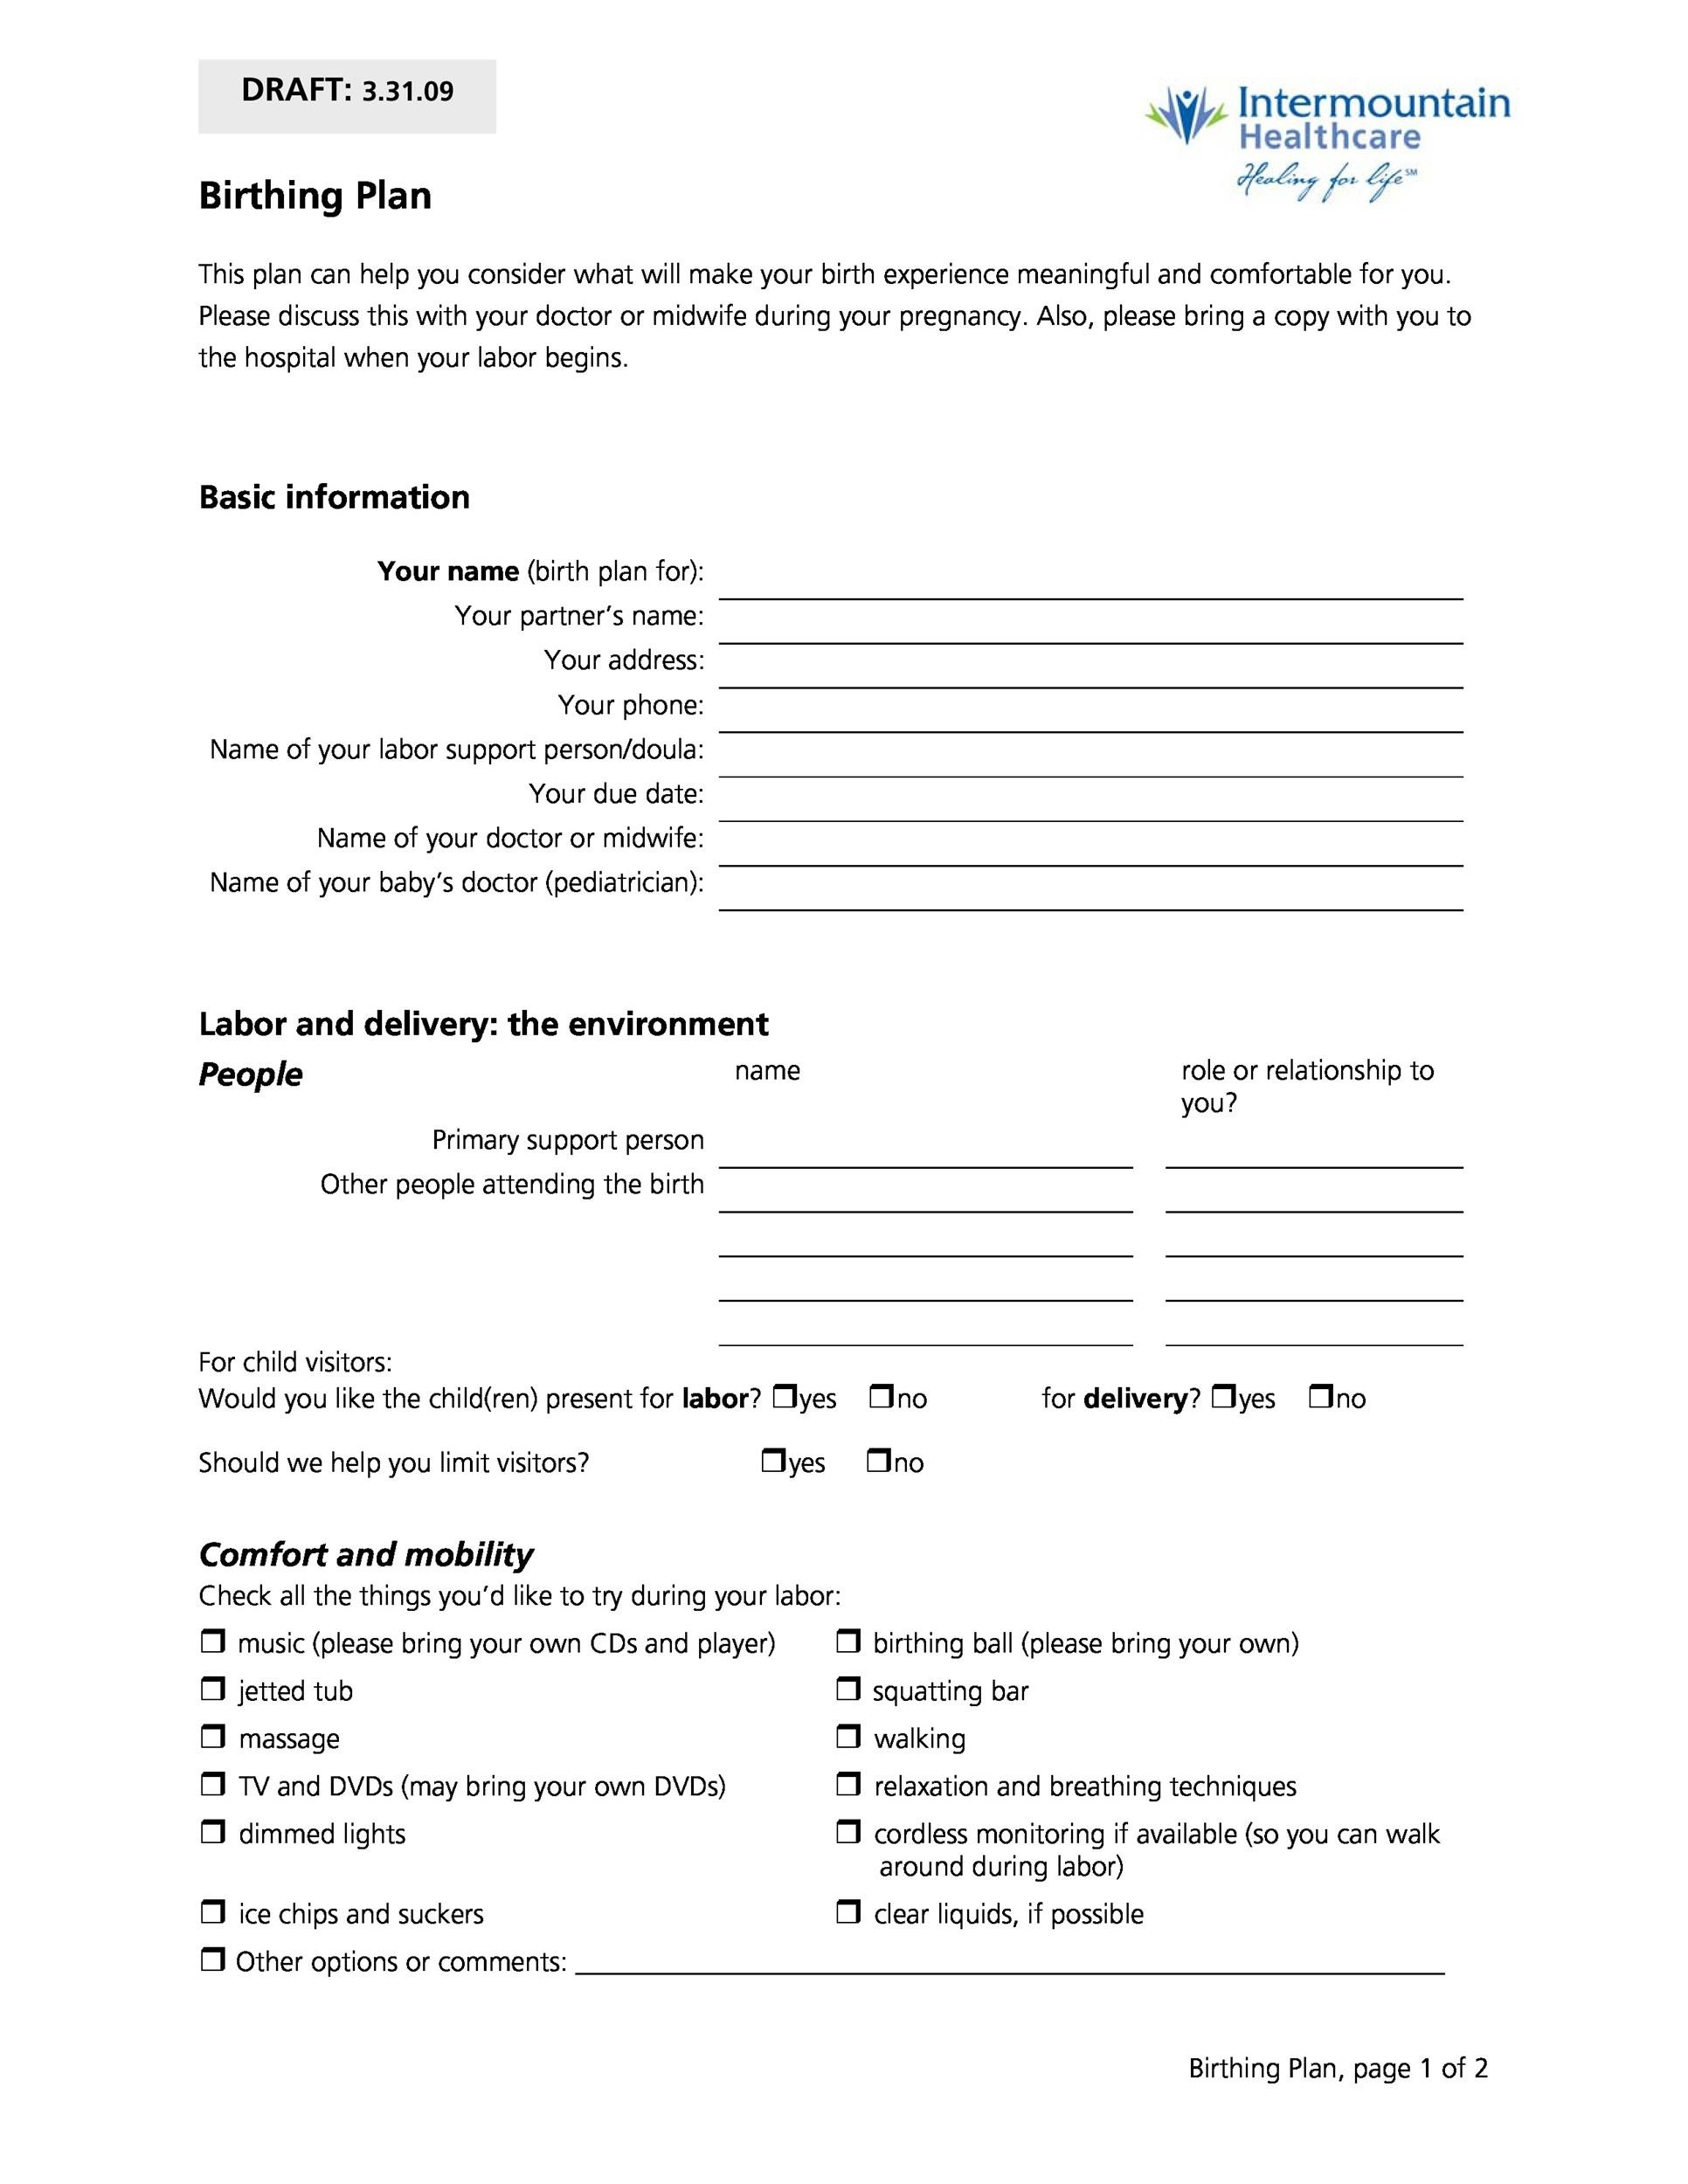 editable birth plan - Josemulinohouse - editable birth plan